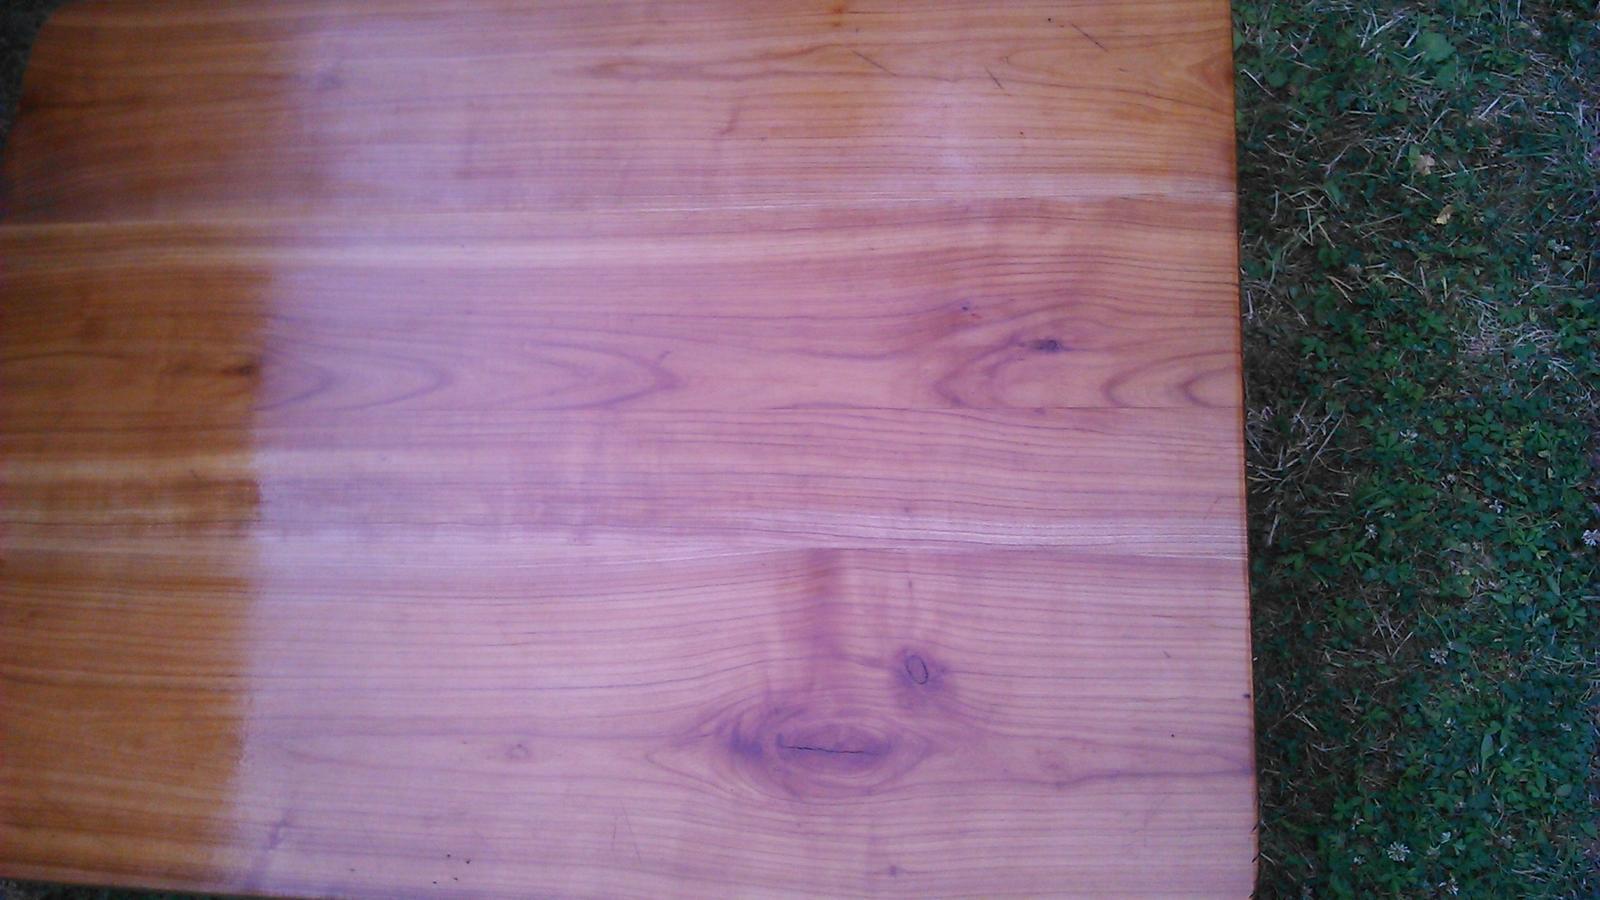 Premeny - čerstvo natretá doska stola na chalupe.